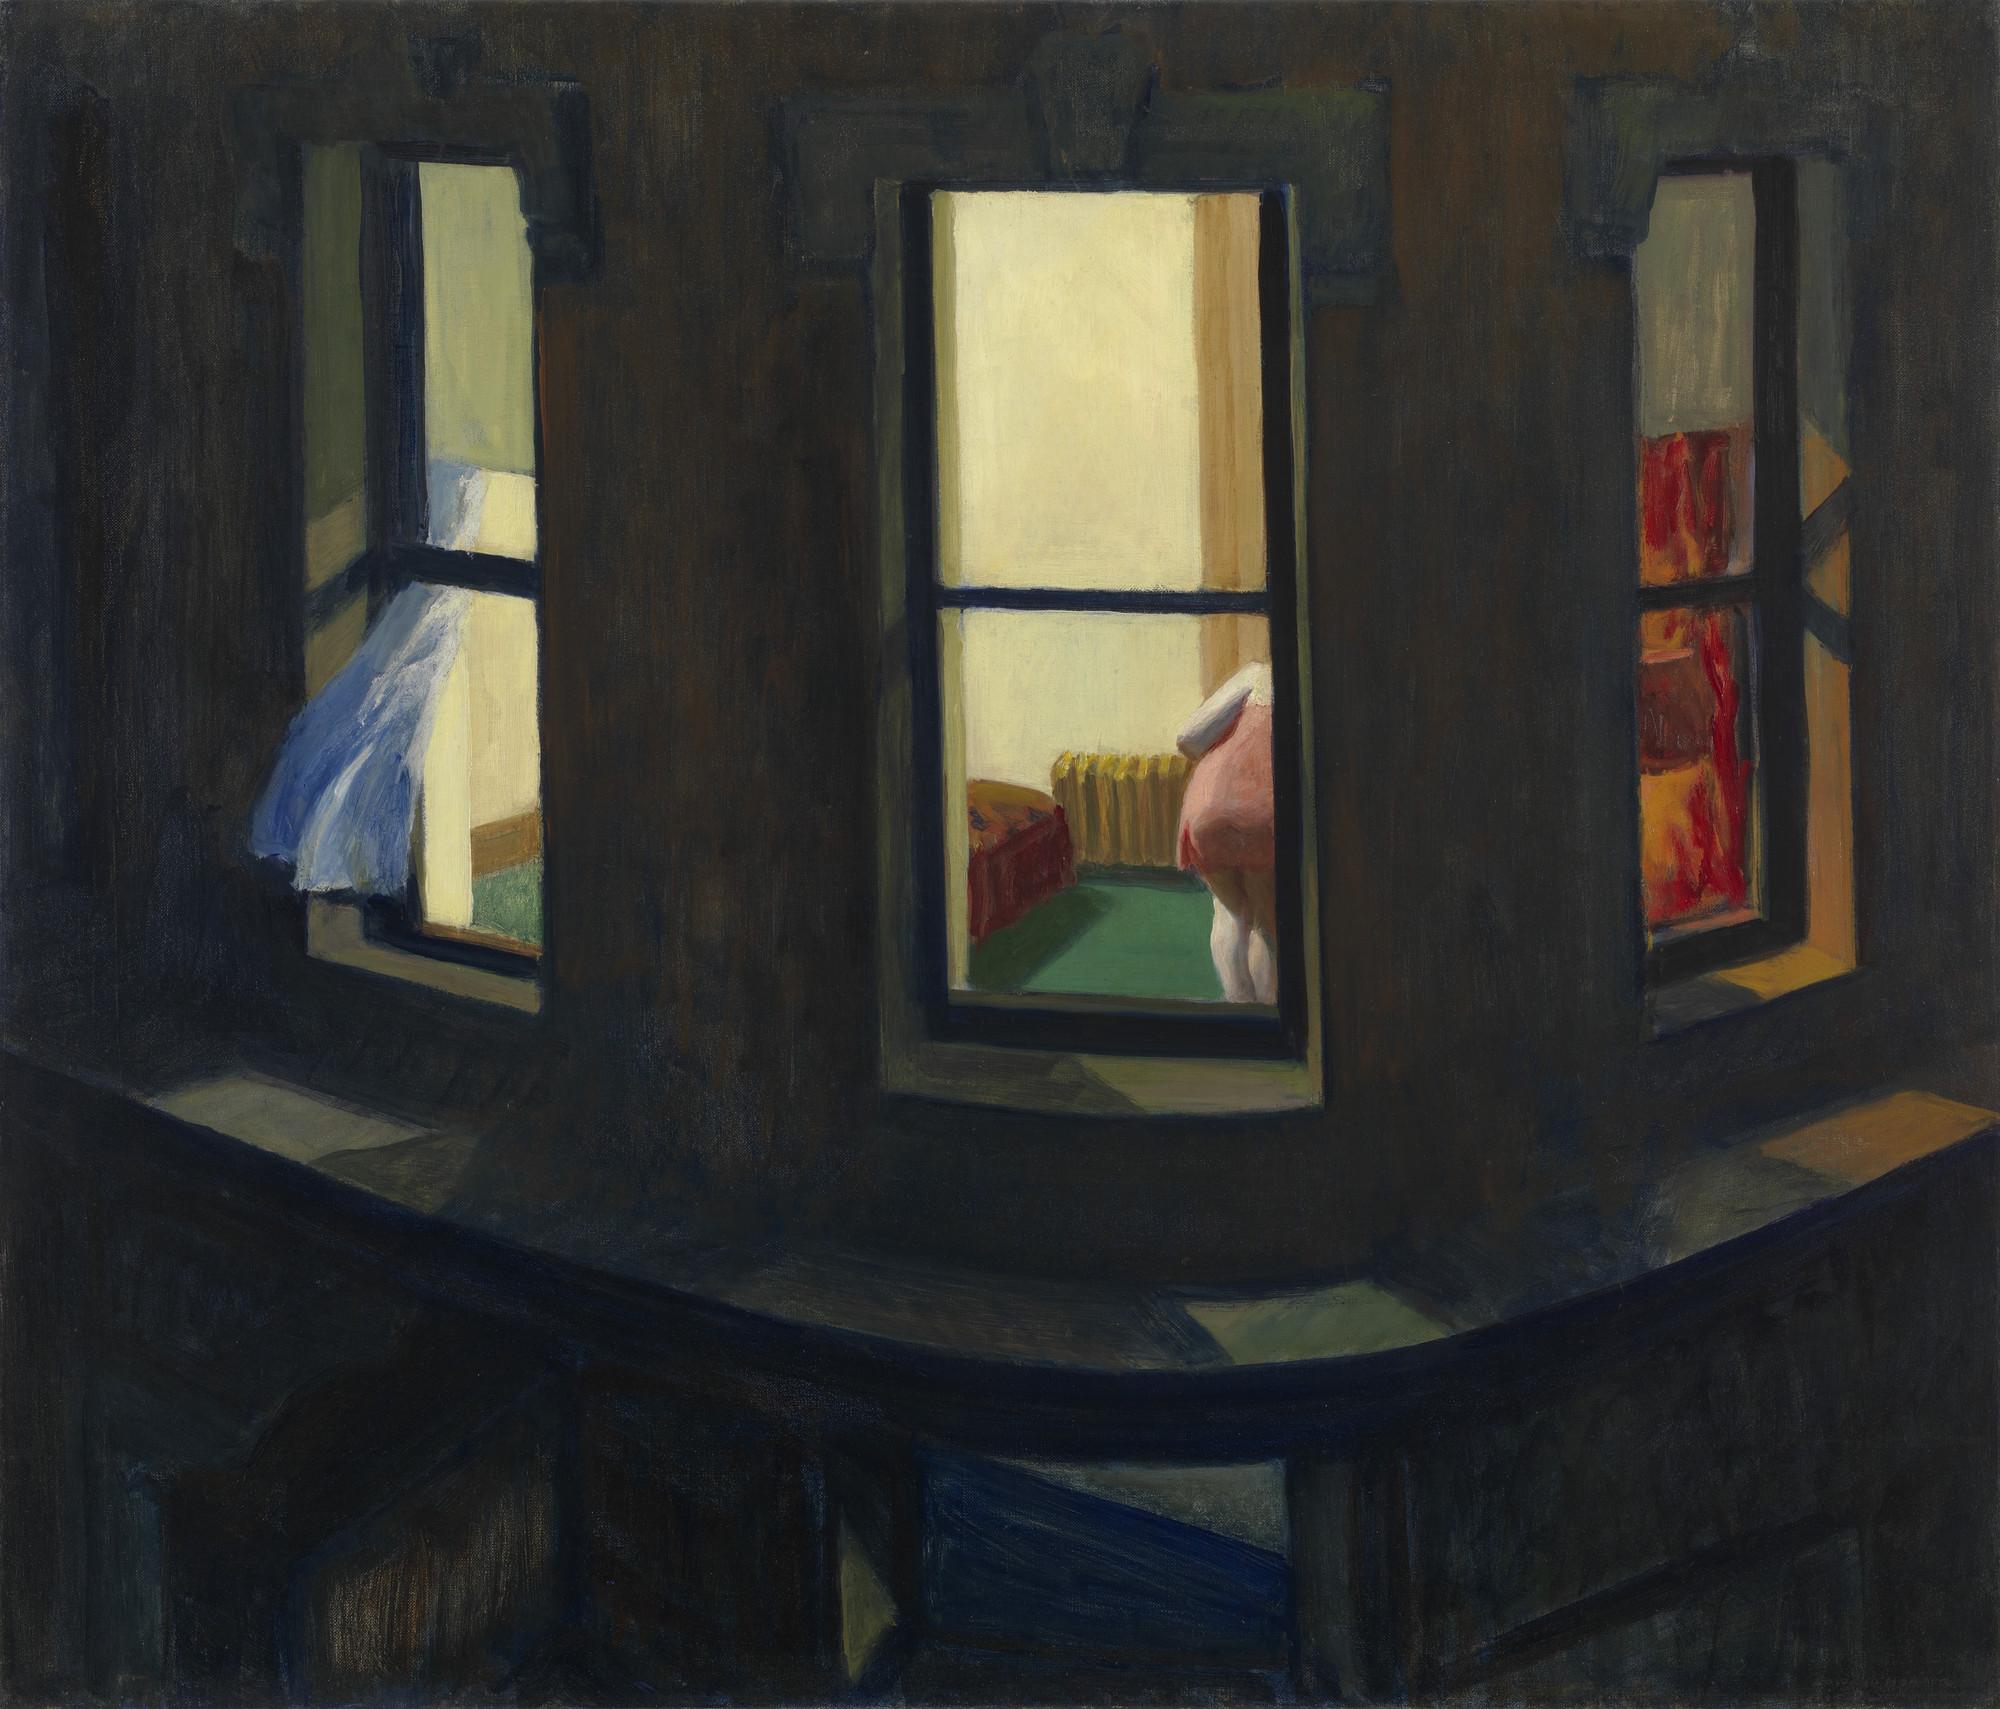 Edward Hopper. Night Windows. 1928 | MoMA